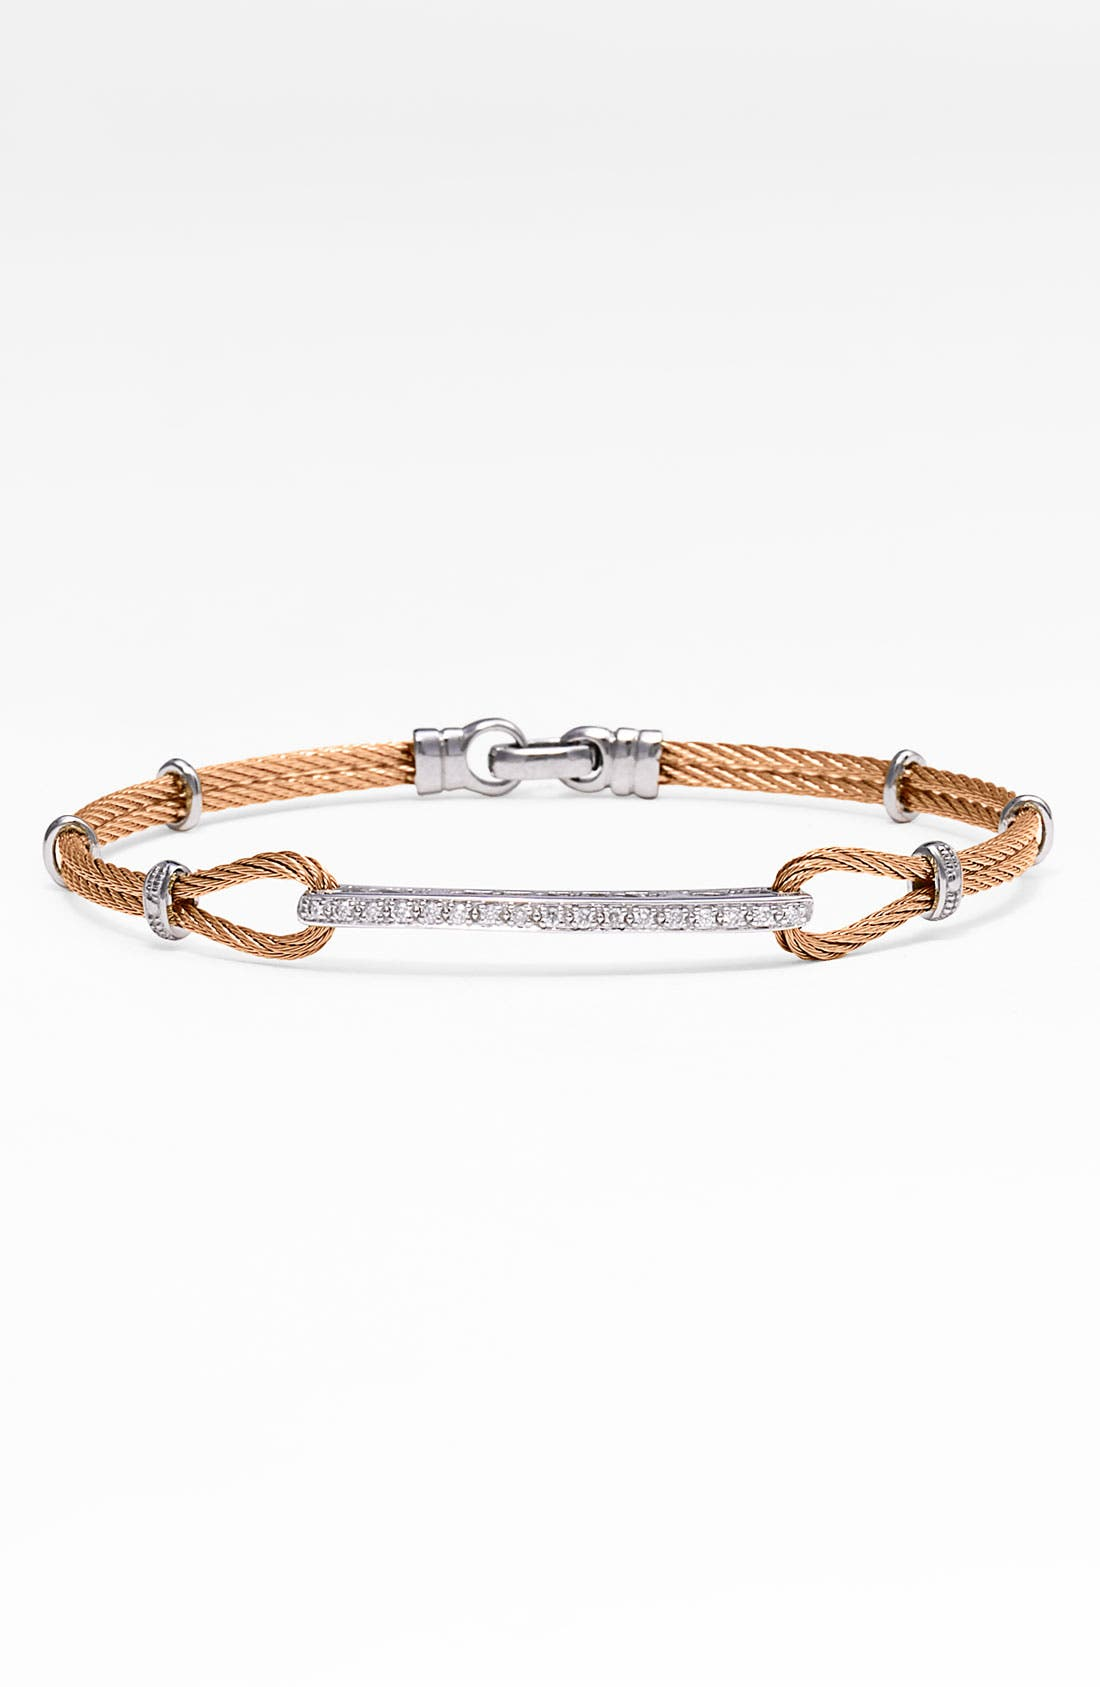 Alternate Image 1 Selected - ALOR® Diamond ID Bracelet